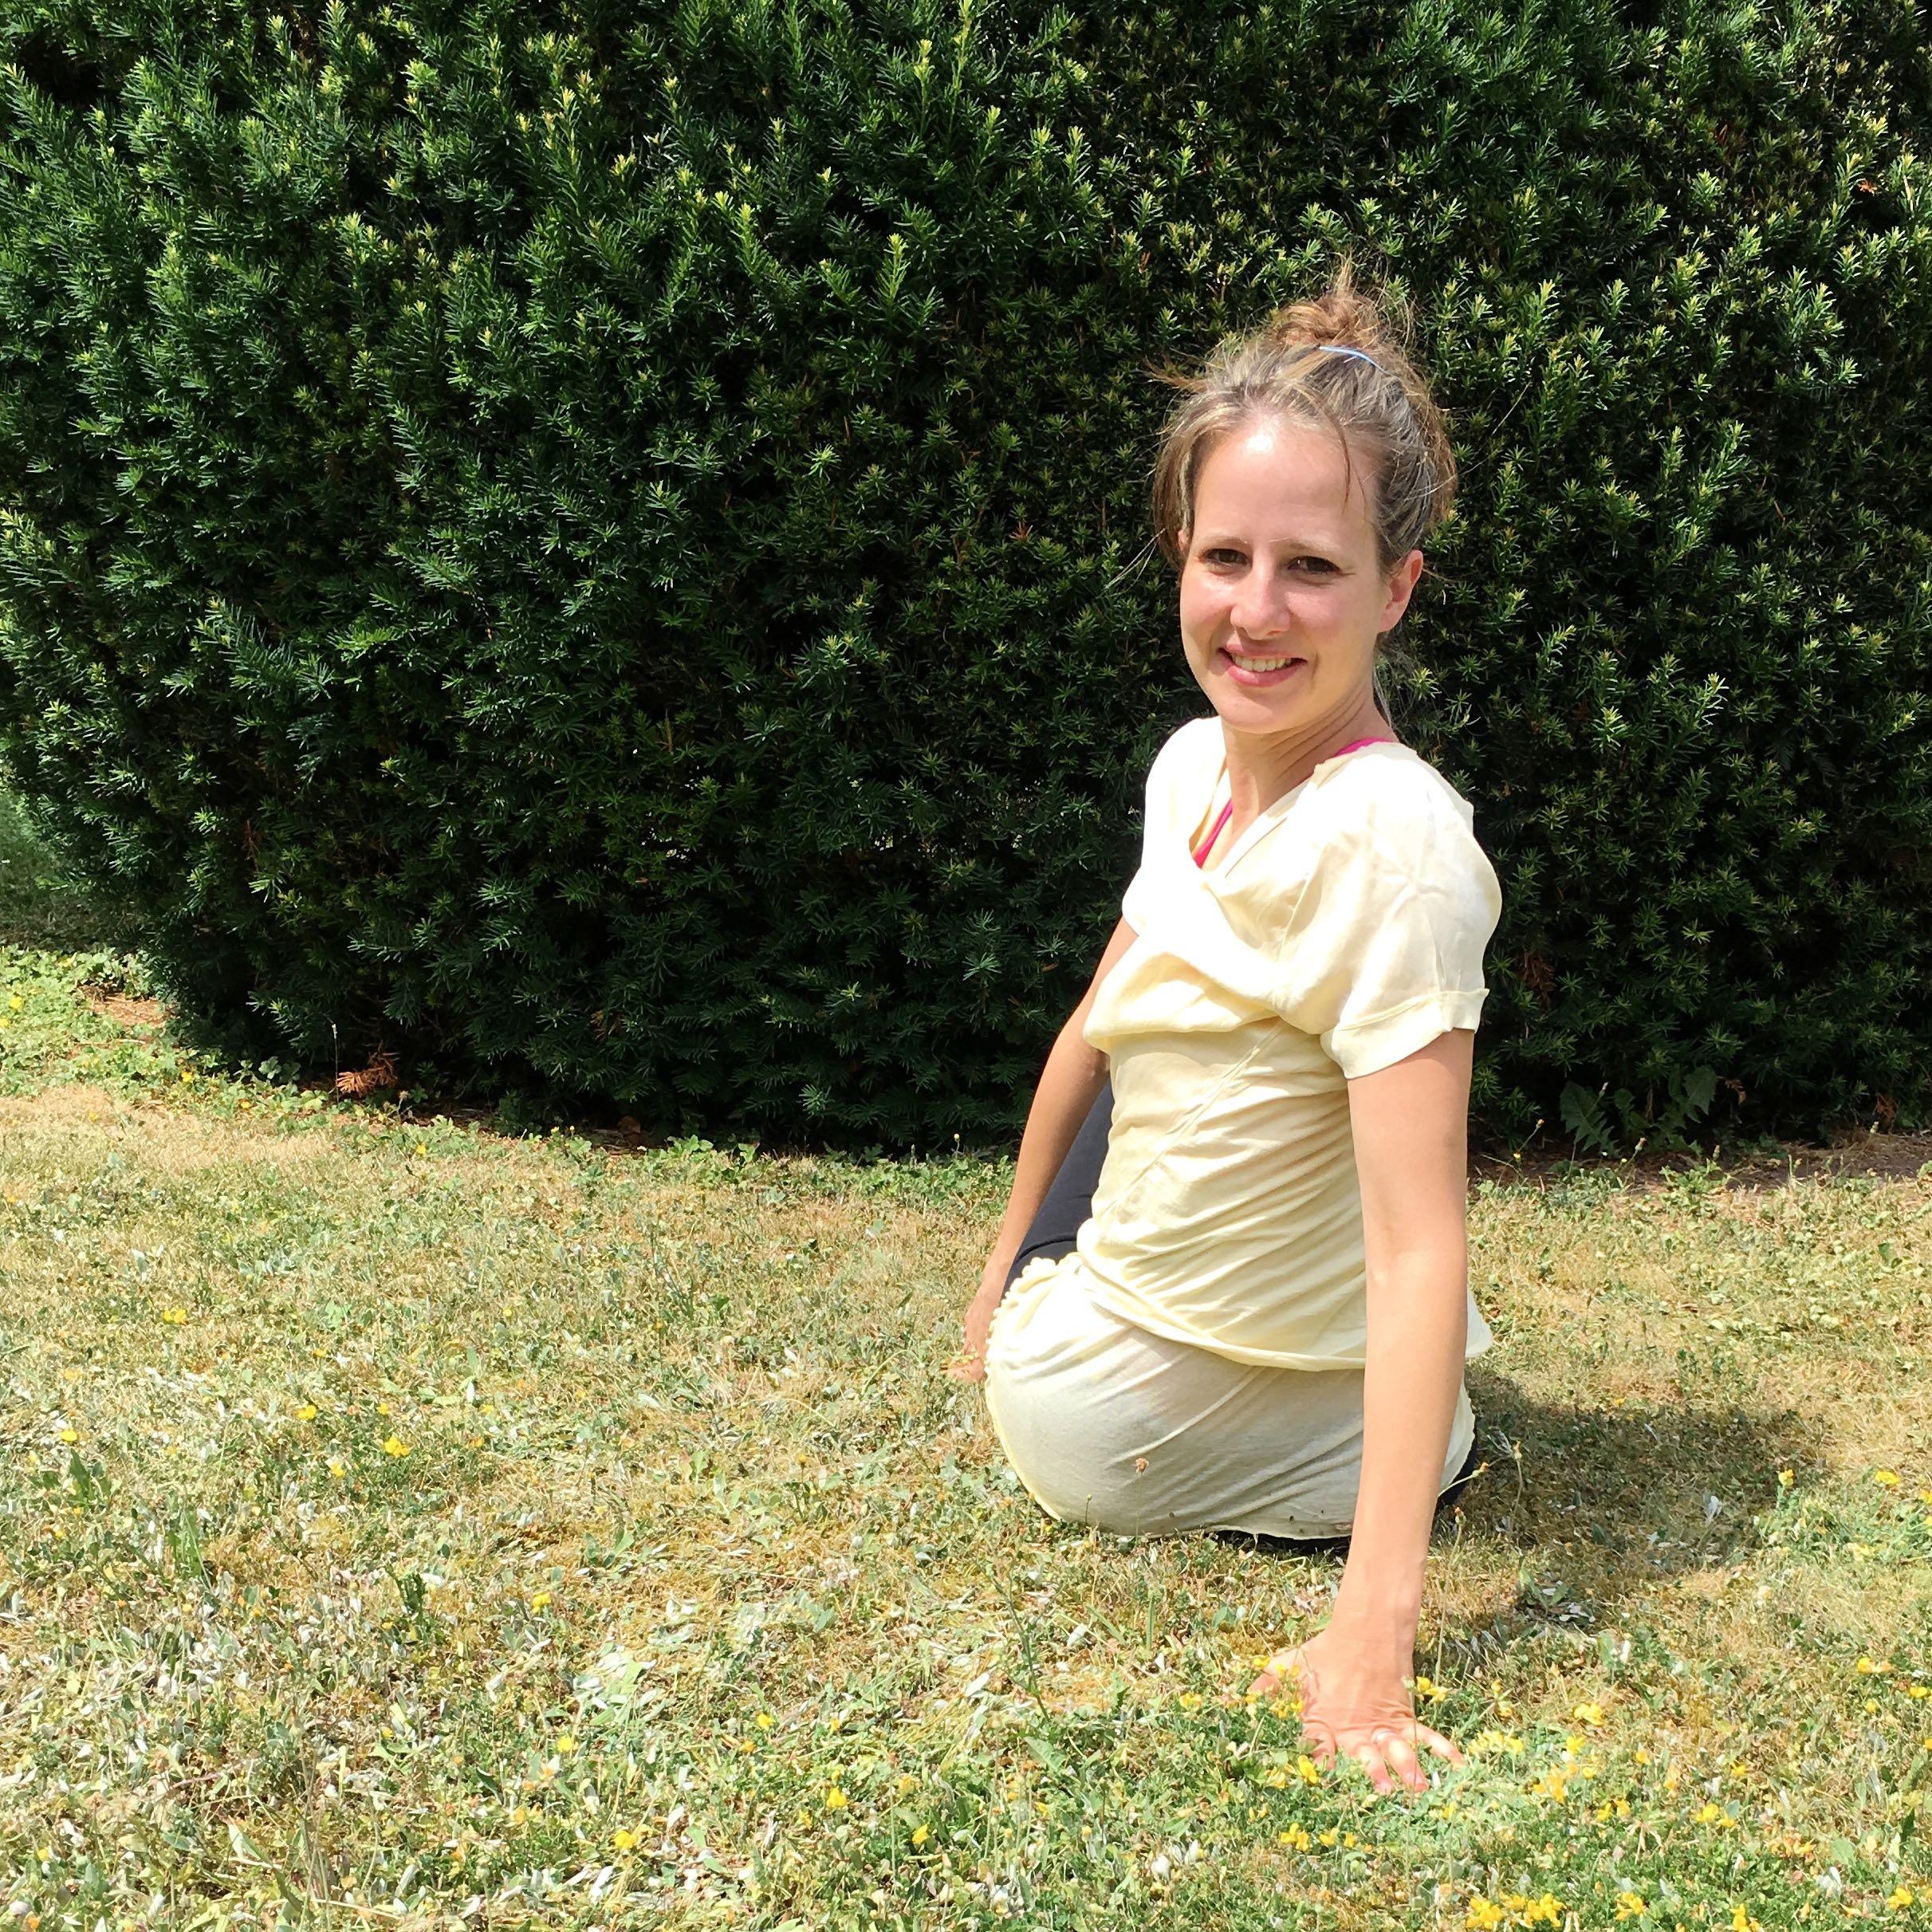 Lotte übt den Drehsitz im Garten